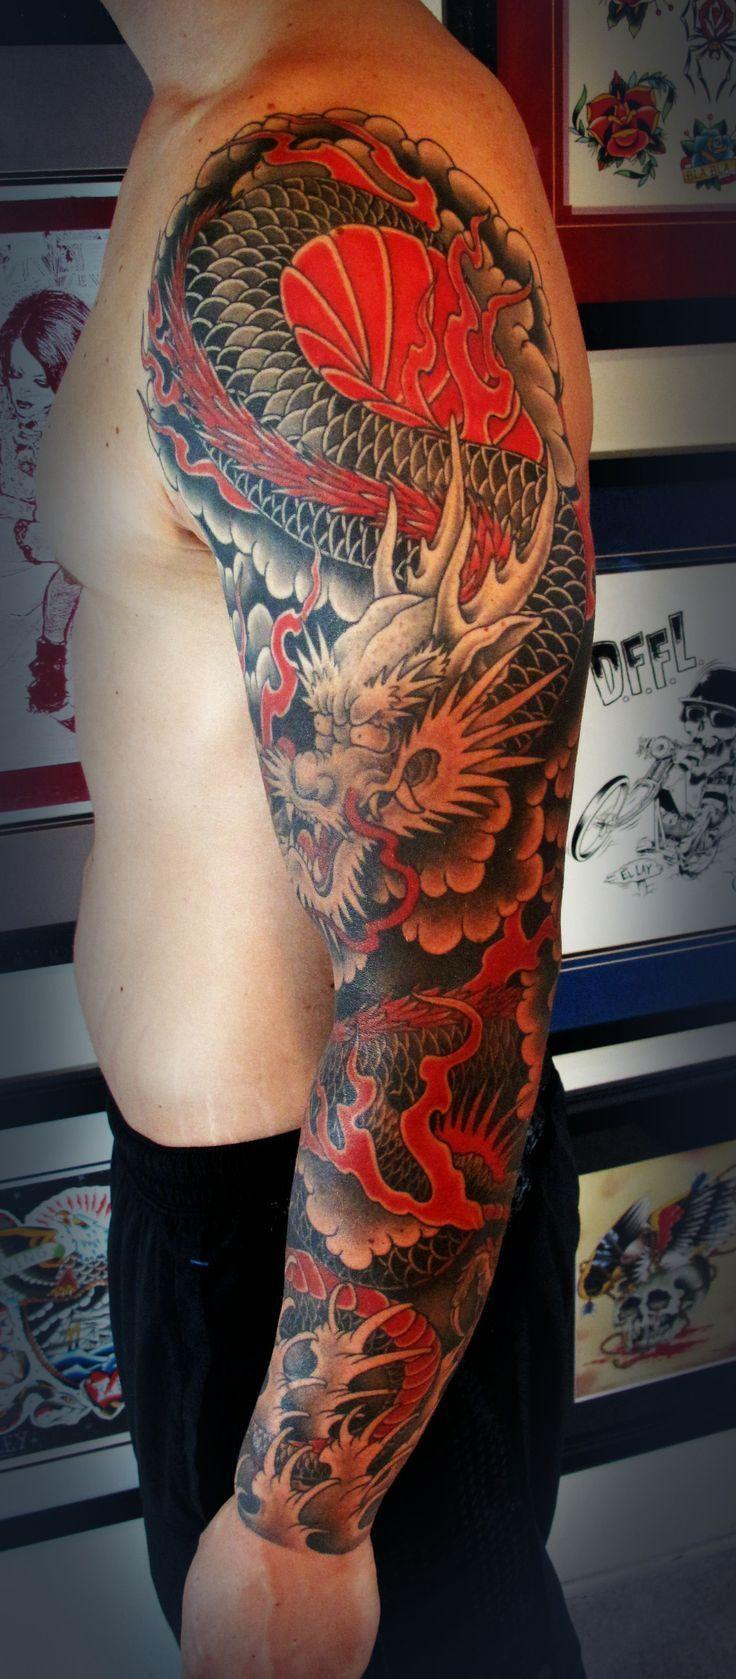 Another Sleeve Dragon Tattoo | 10 Ориентал | Pinterest | Dragons ...